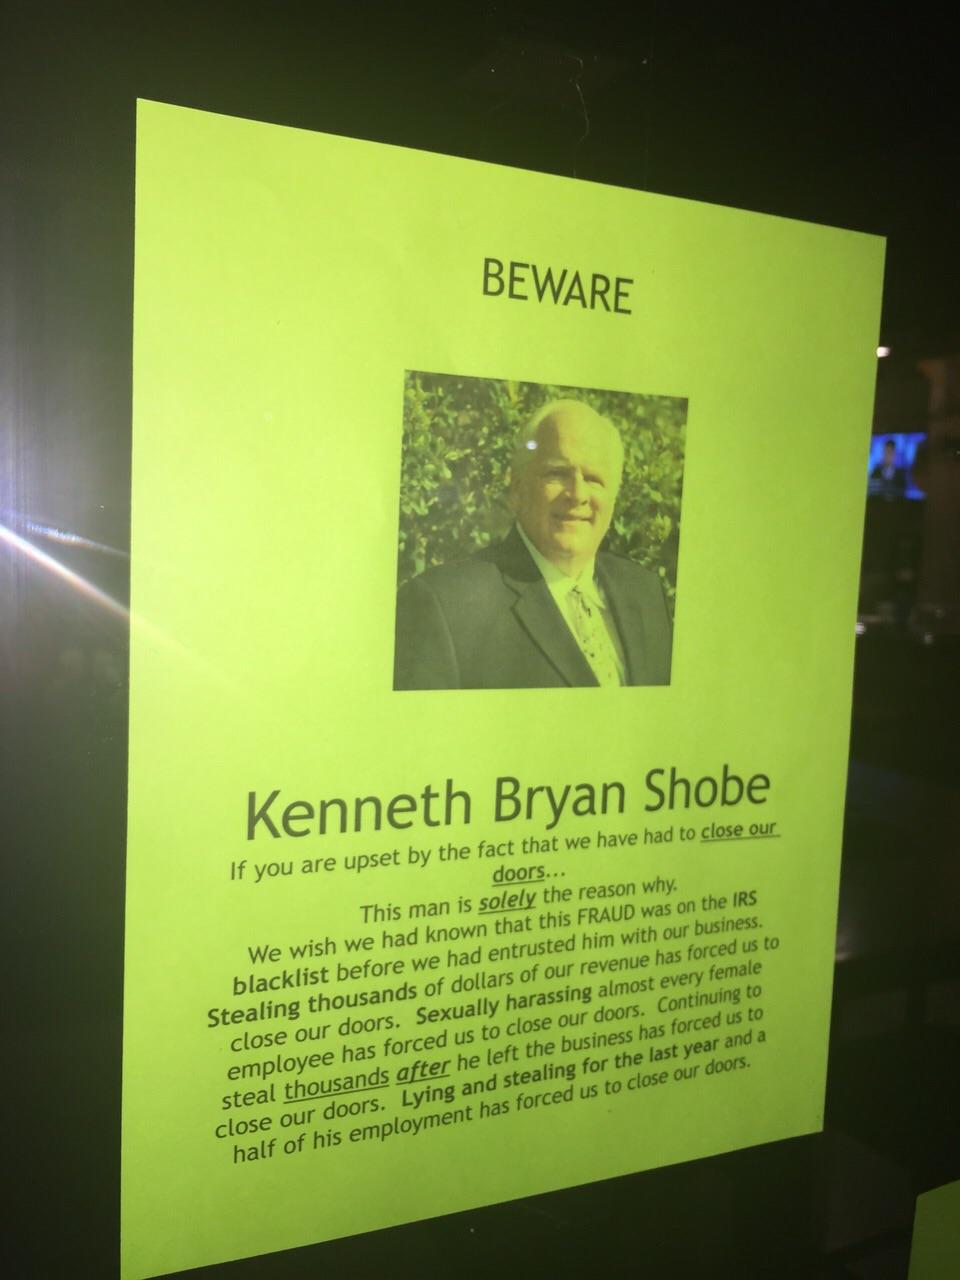 Criminal Bryan Shobe Bradenton Florida US